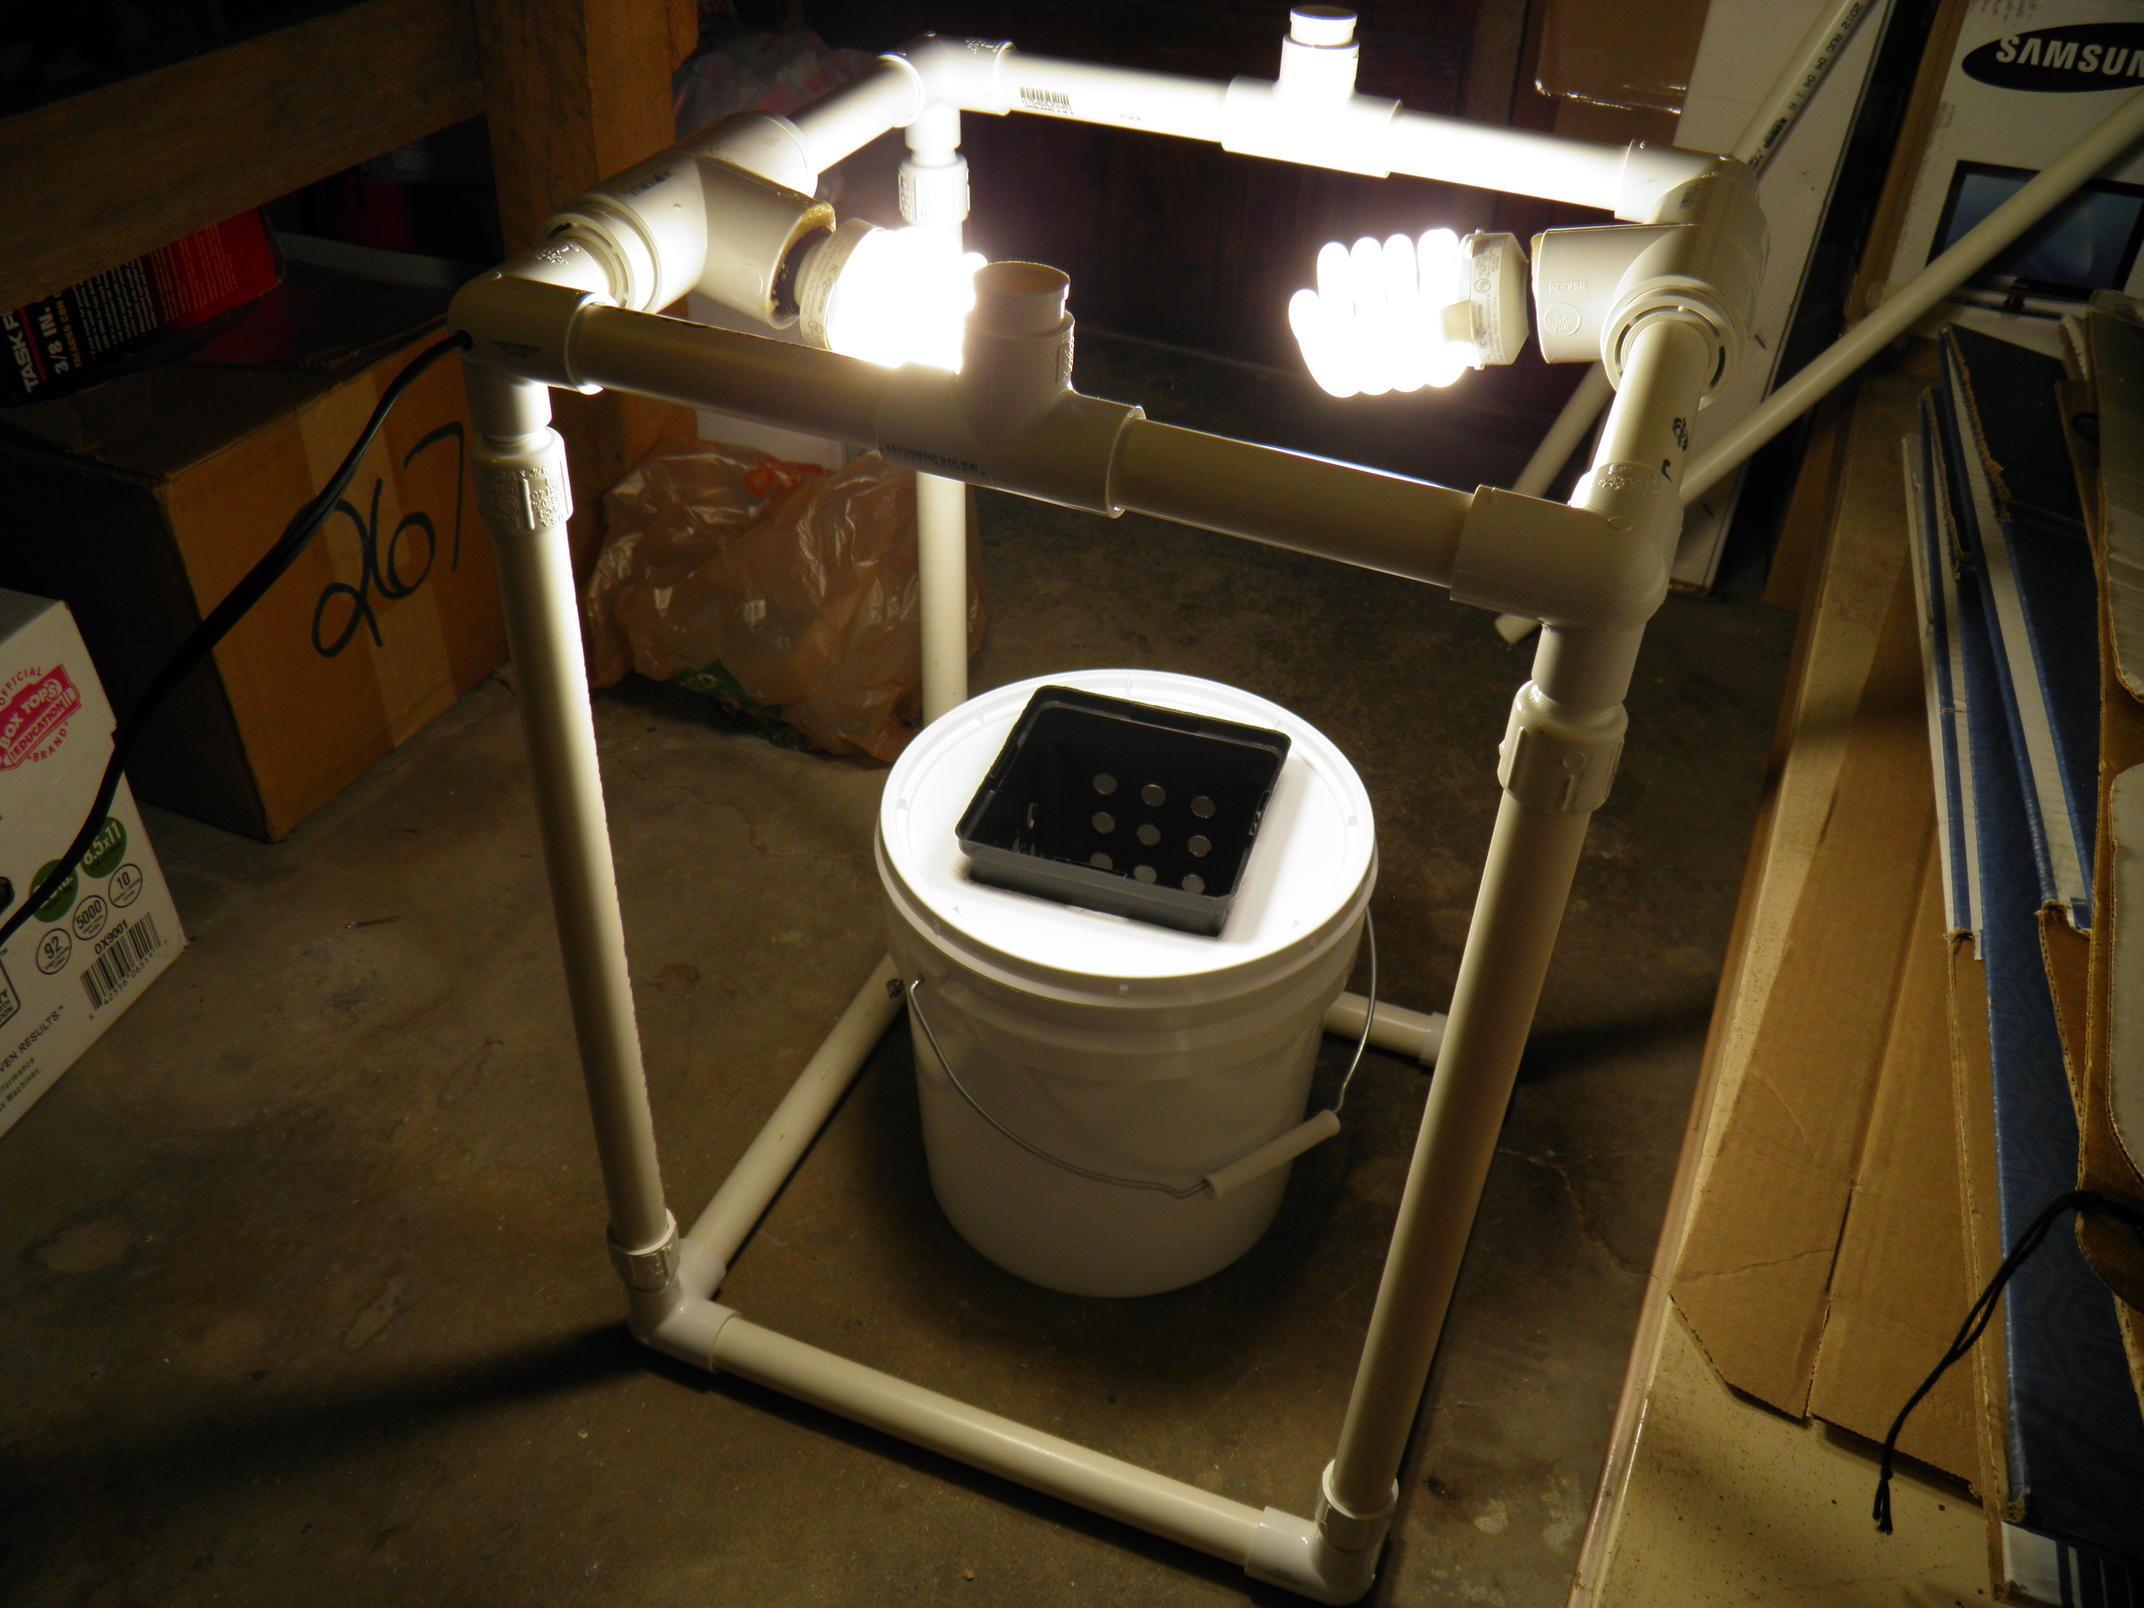 Final Setup with Lights Tested